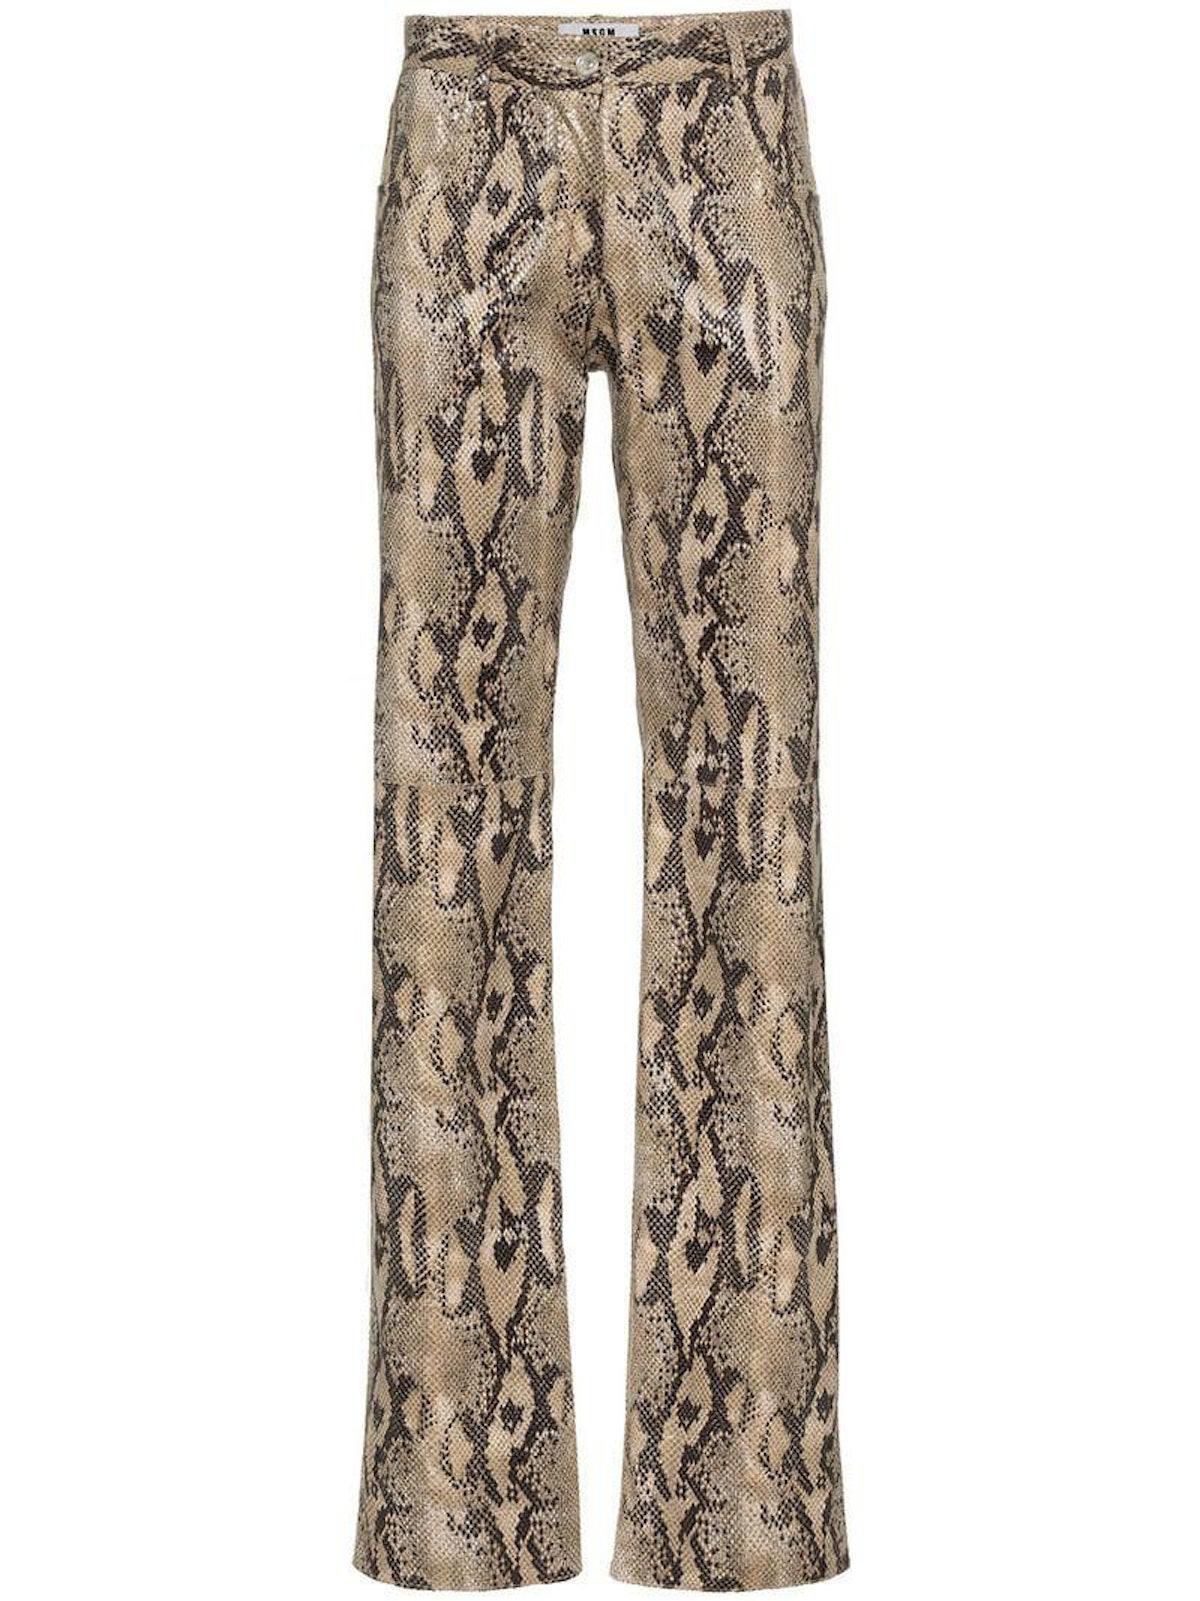 Python Print Trousers